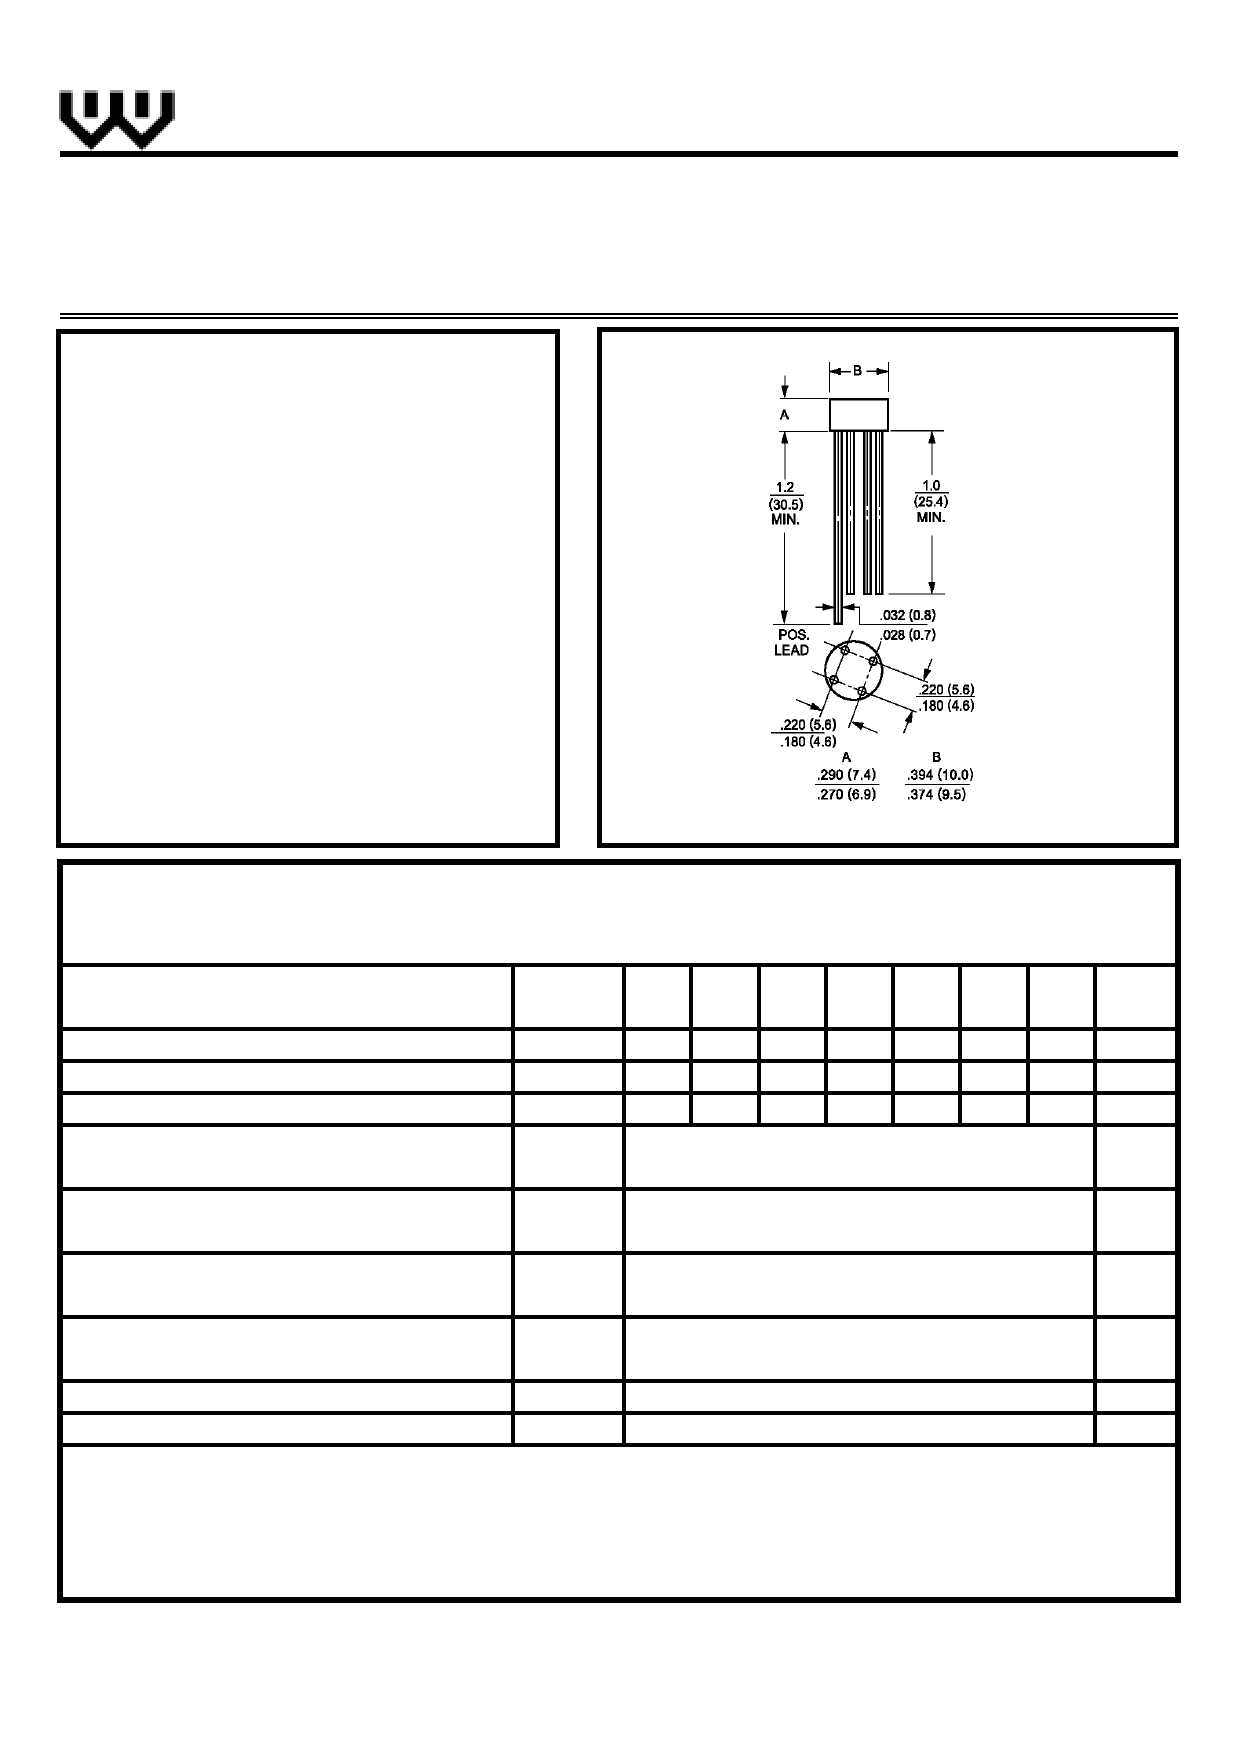 W02 datasheet